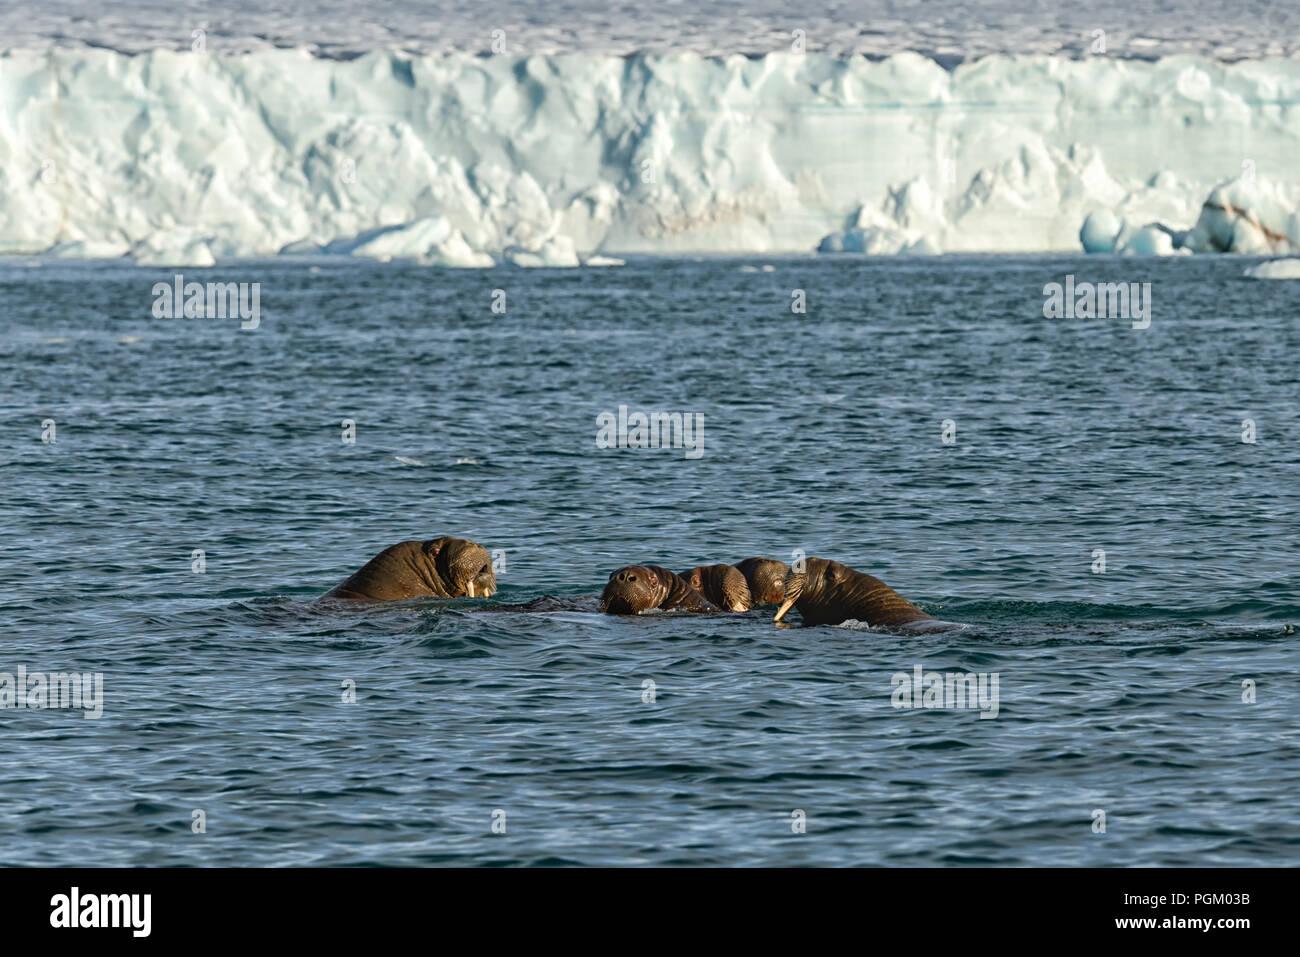 Group of walruses swimming in sea in front of Bråsvellbreen, Austfonna, Nordaustlandet, Svalbard Archipelago, Norway Stock Photo